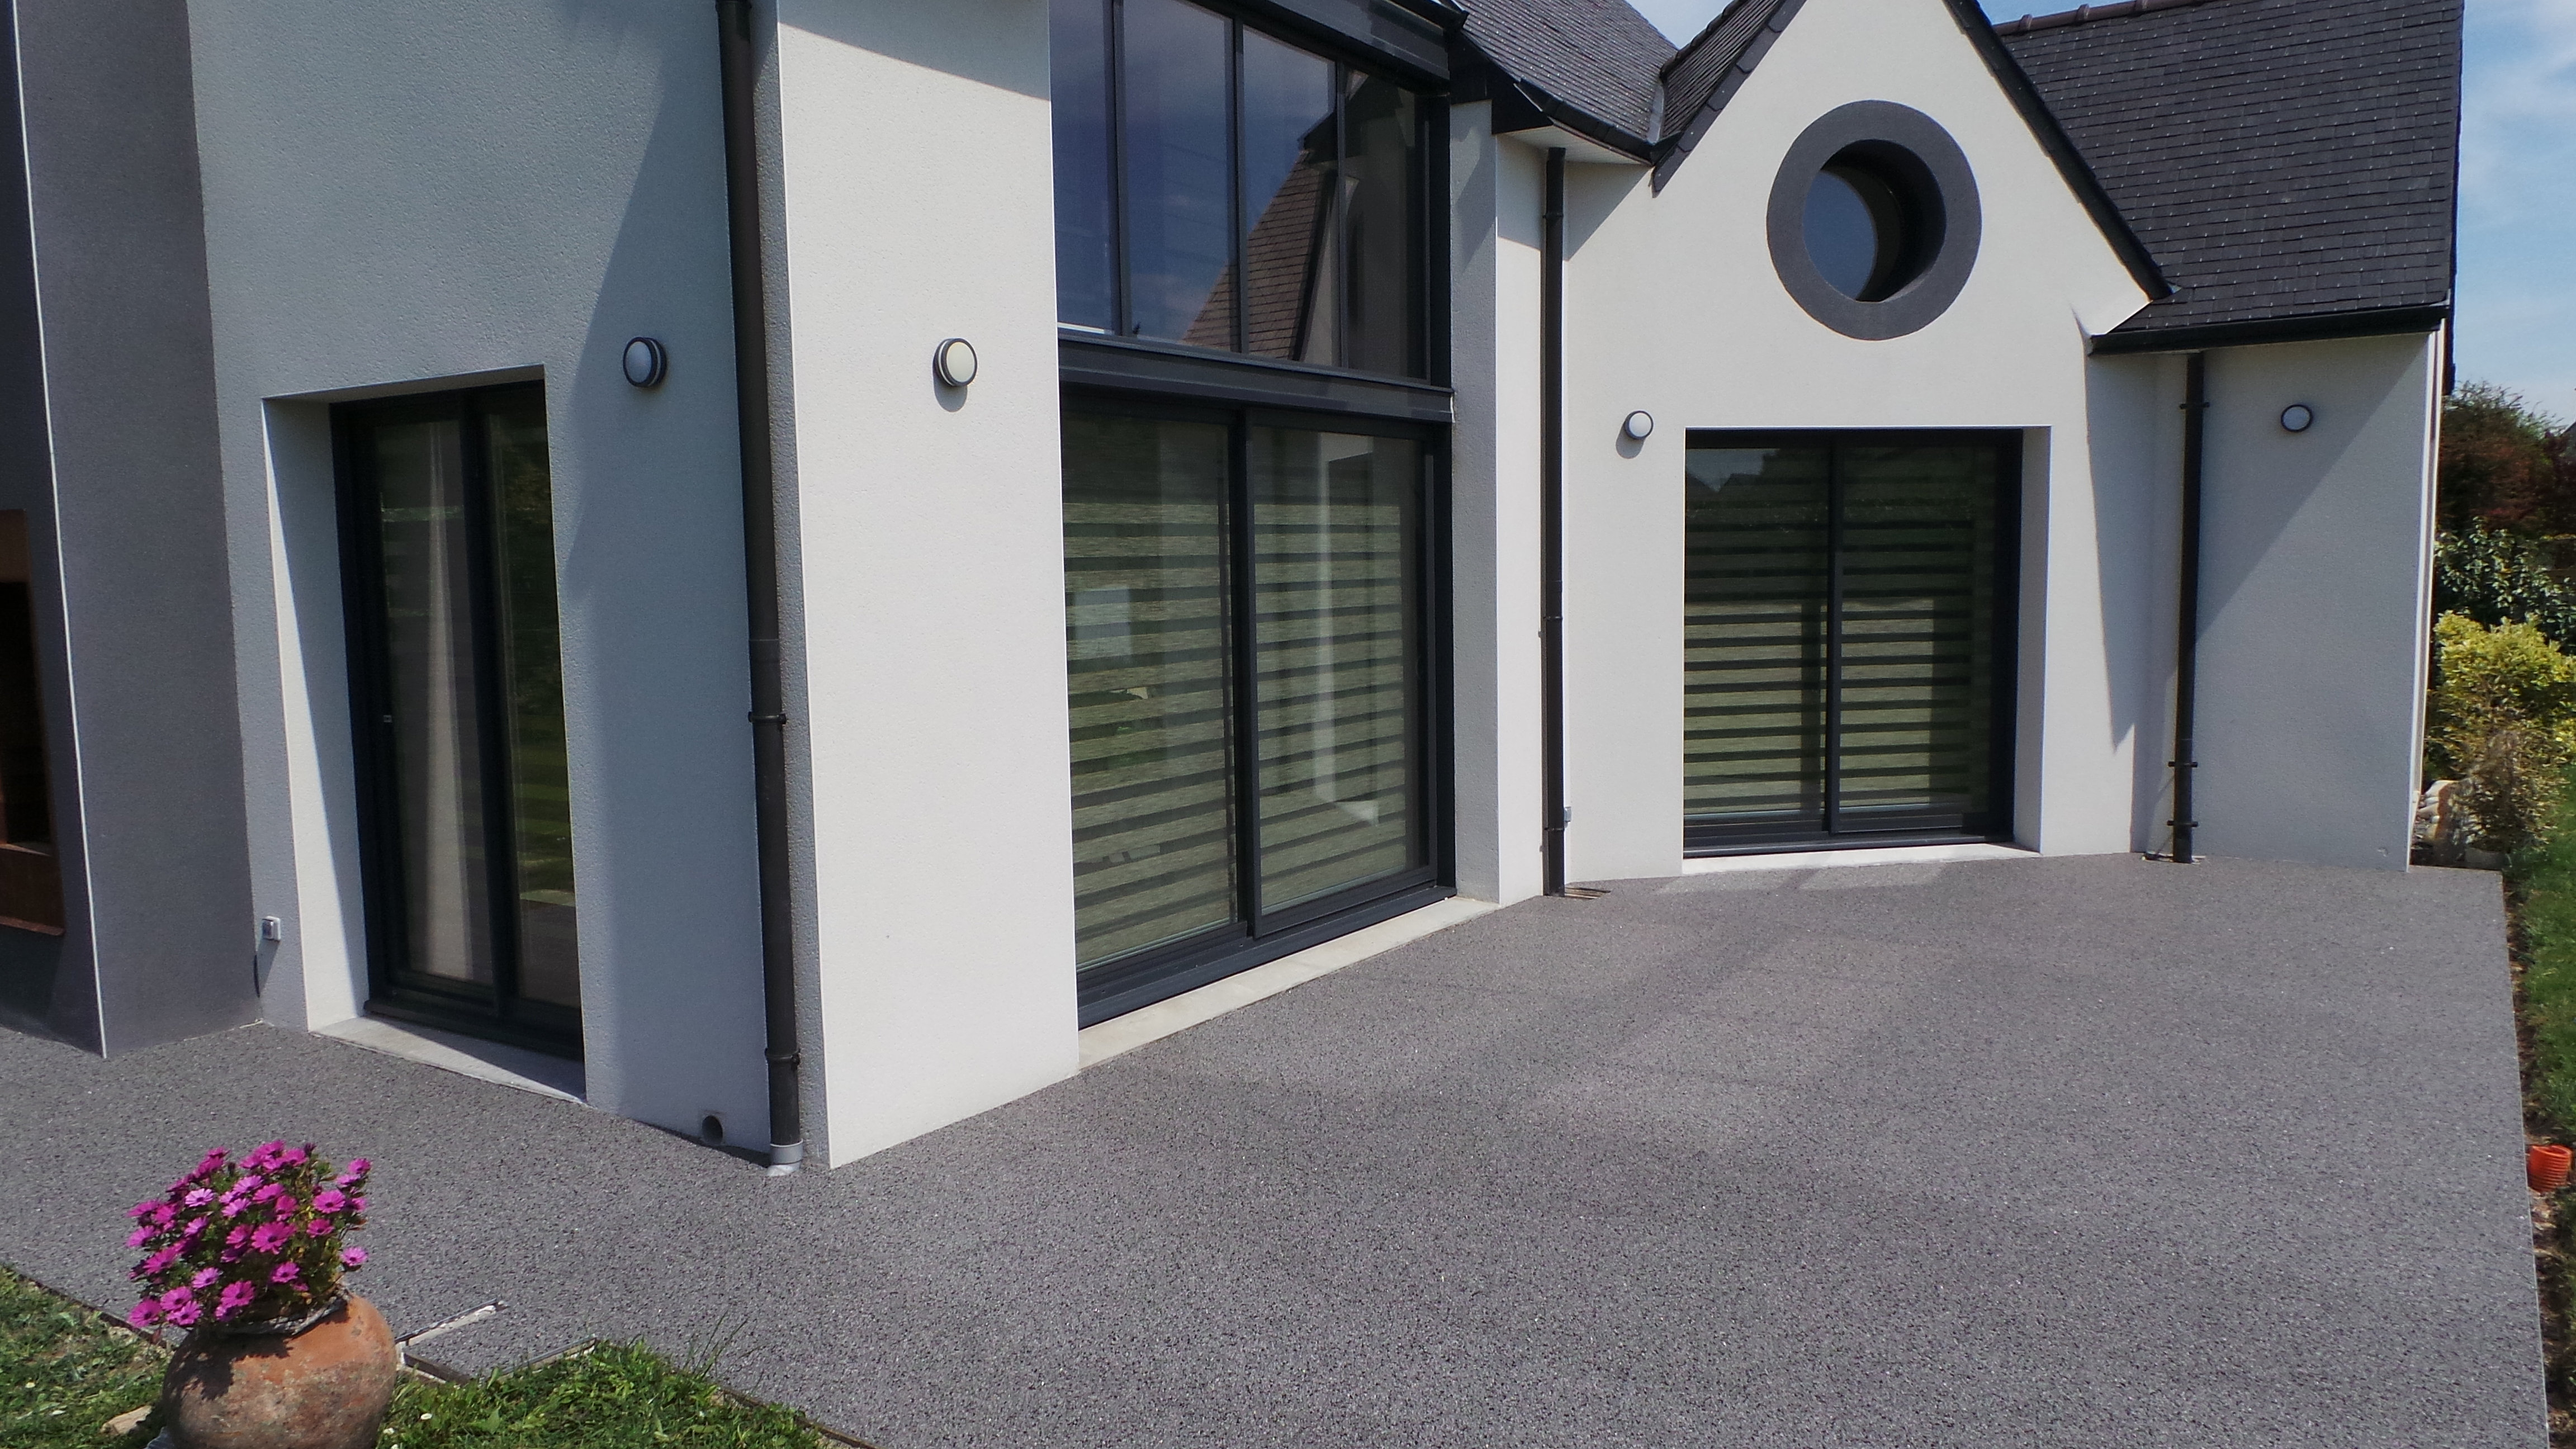 revetement terrasse exterieure resine decoration revetement terasse terrasse revetement sol. Black Bedroom Furniture Sets. Home Design Ideas